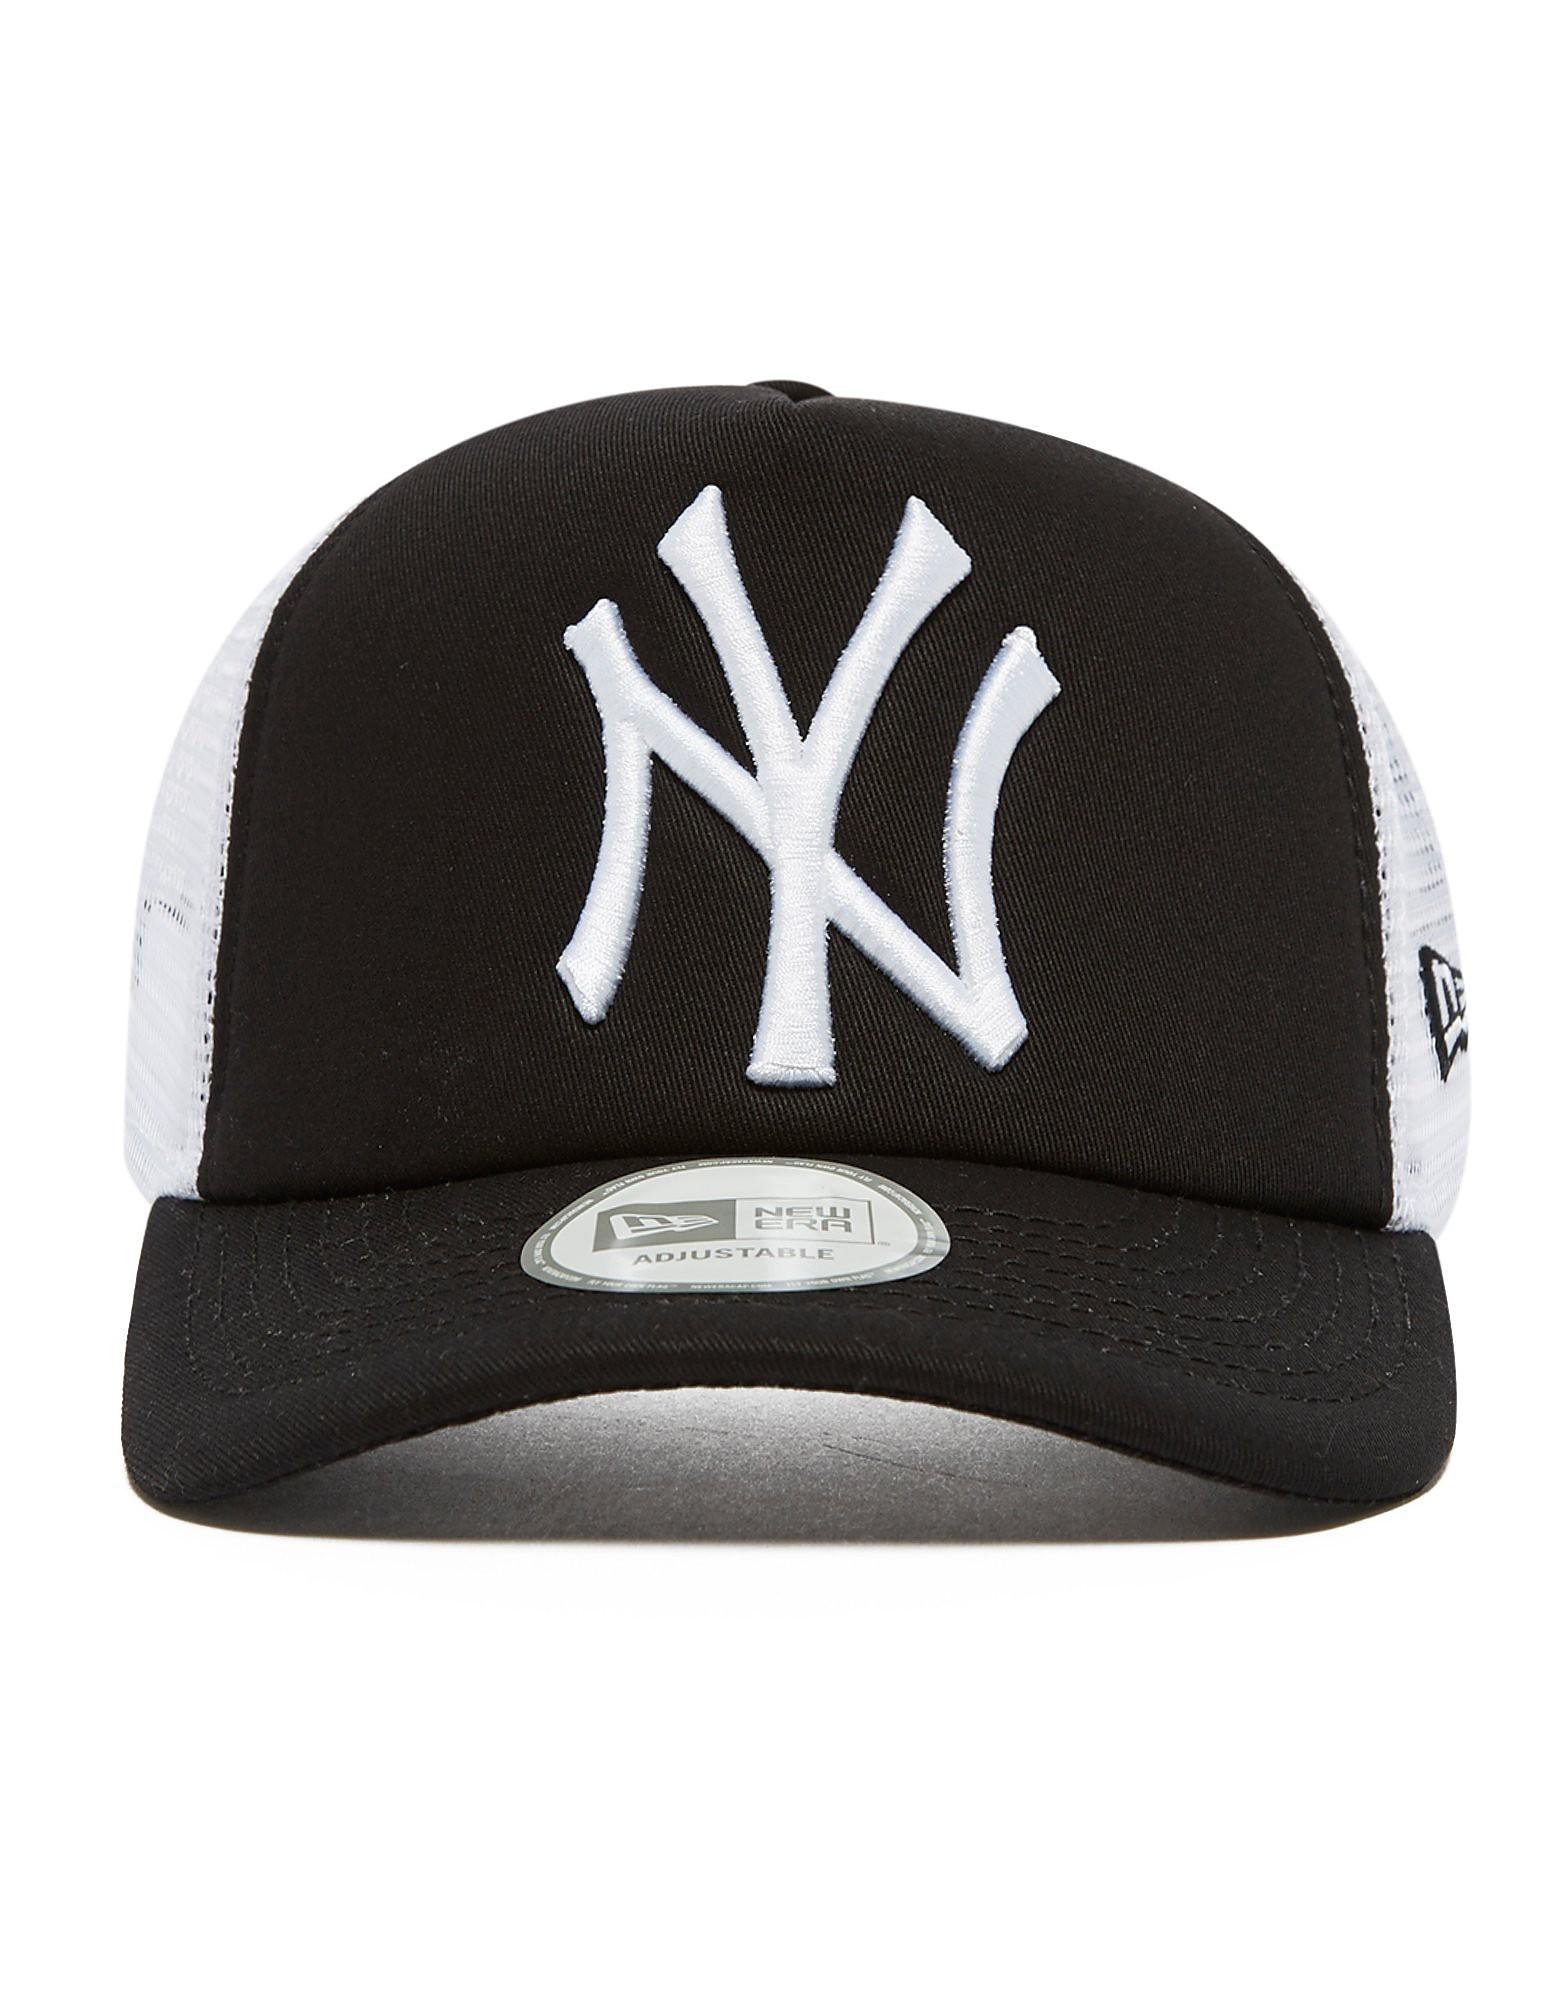 New Era MLB New York Yankees Snapback Trucker Cap